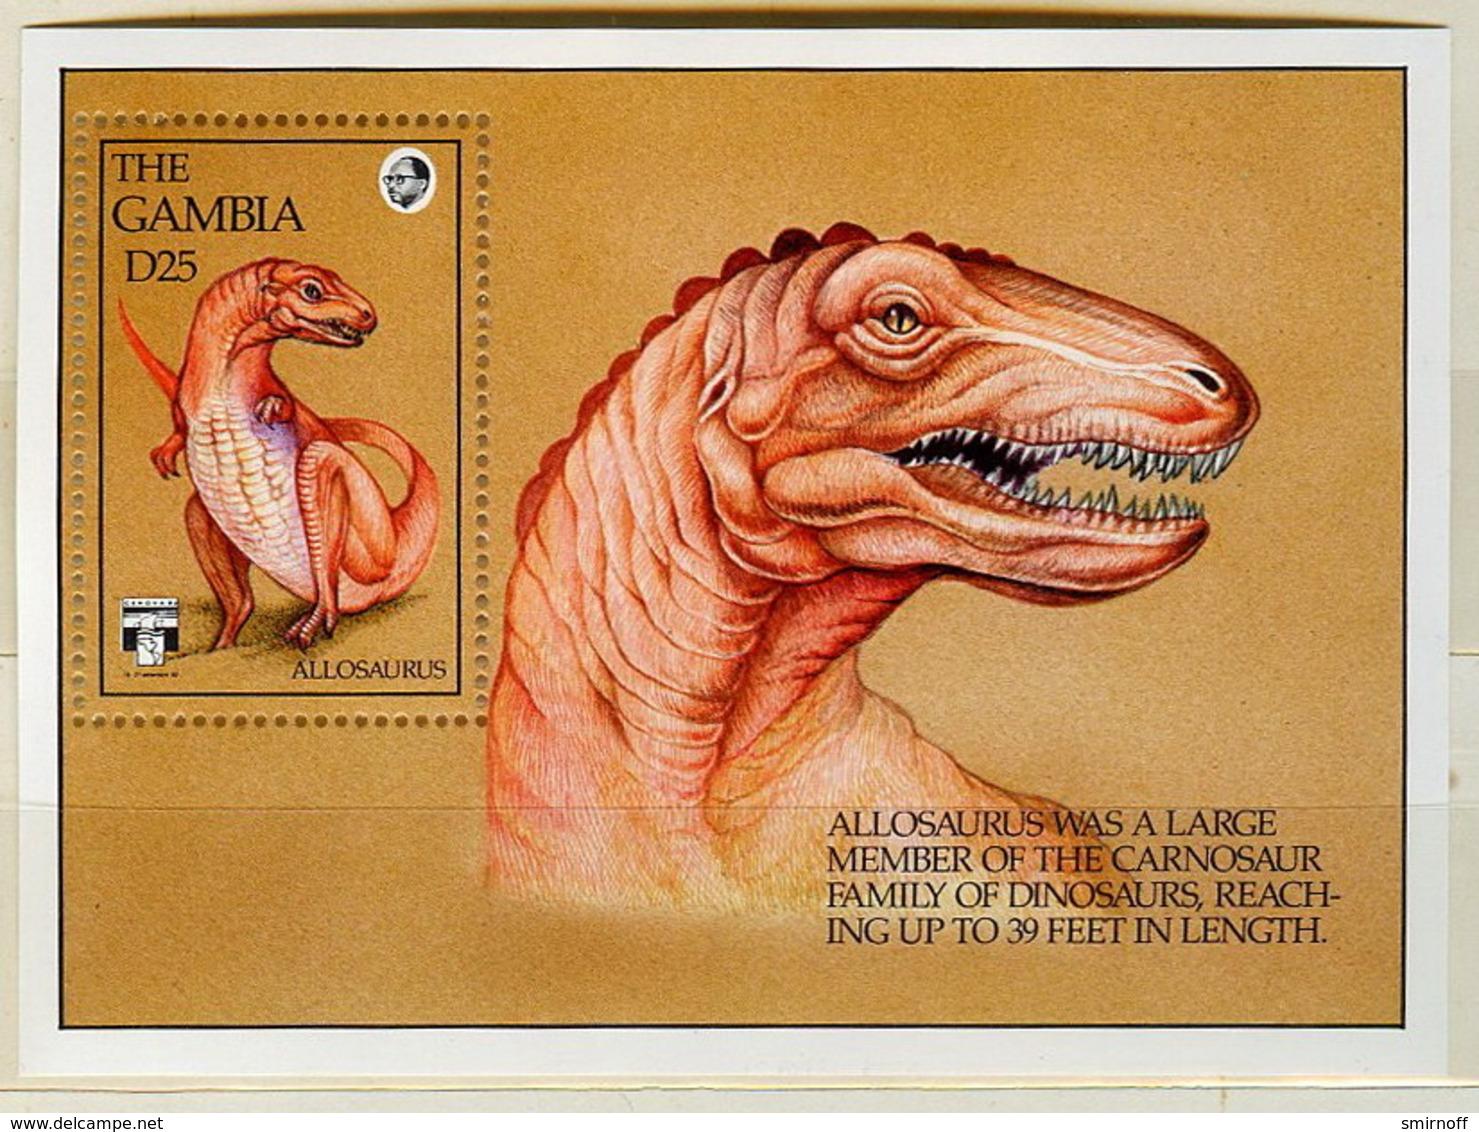 Gambia 1992 Allosaurus Souvenir Sheet Sc 8.00$ - Gambia (1965-...)